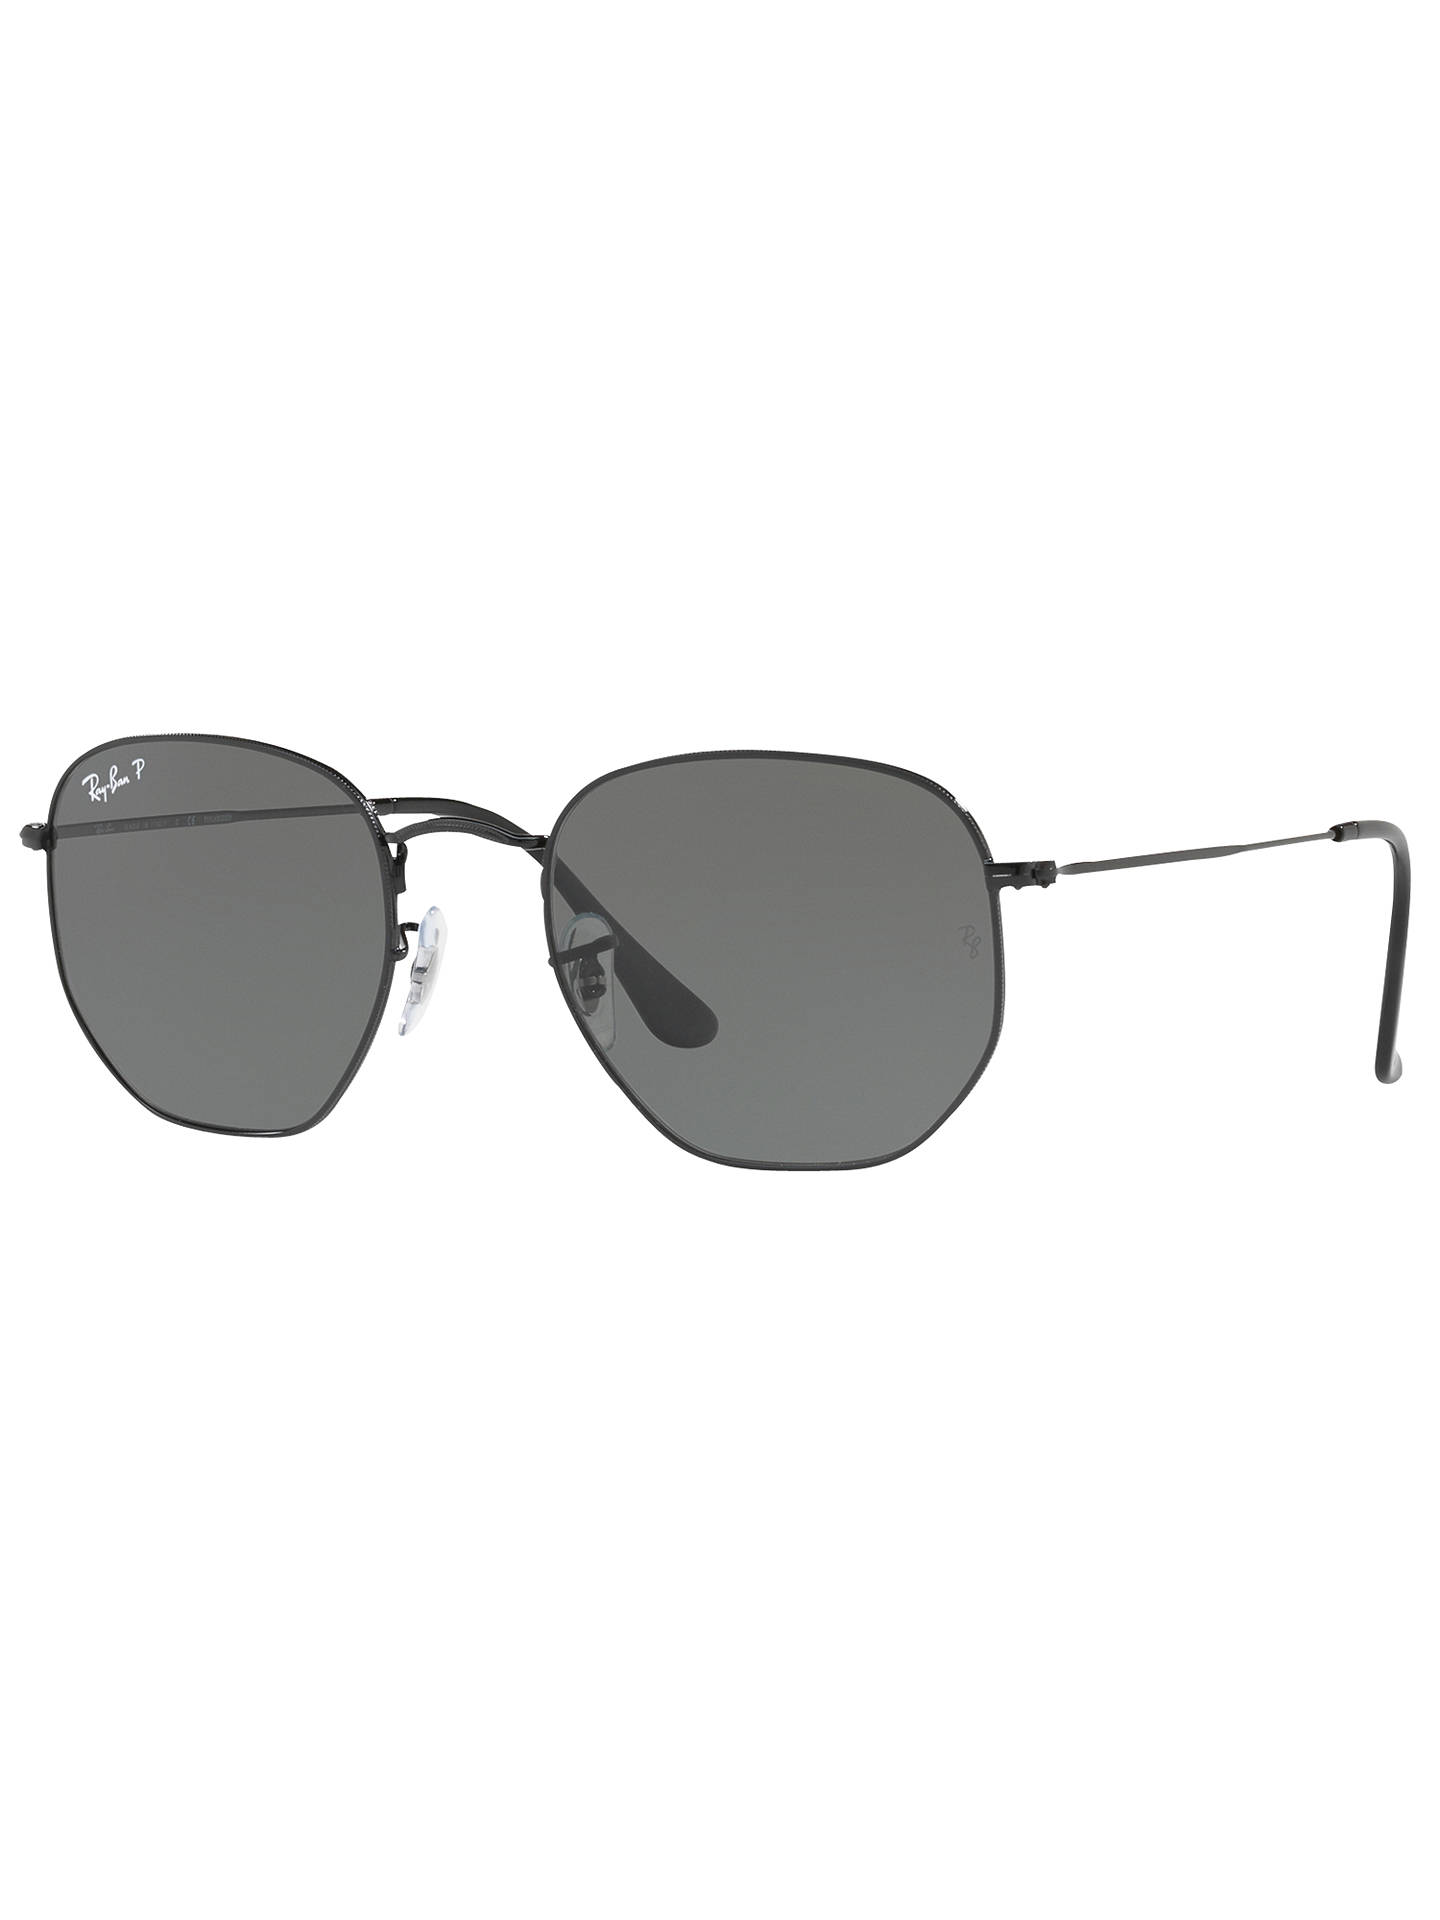 eb1694a23d Ray-Ban RB3548N Polarised Hexagonal Flat Lens Sunglasses at John ...